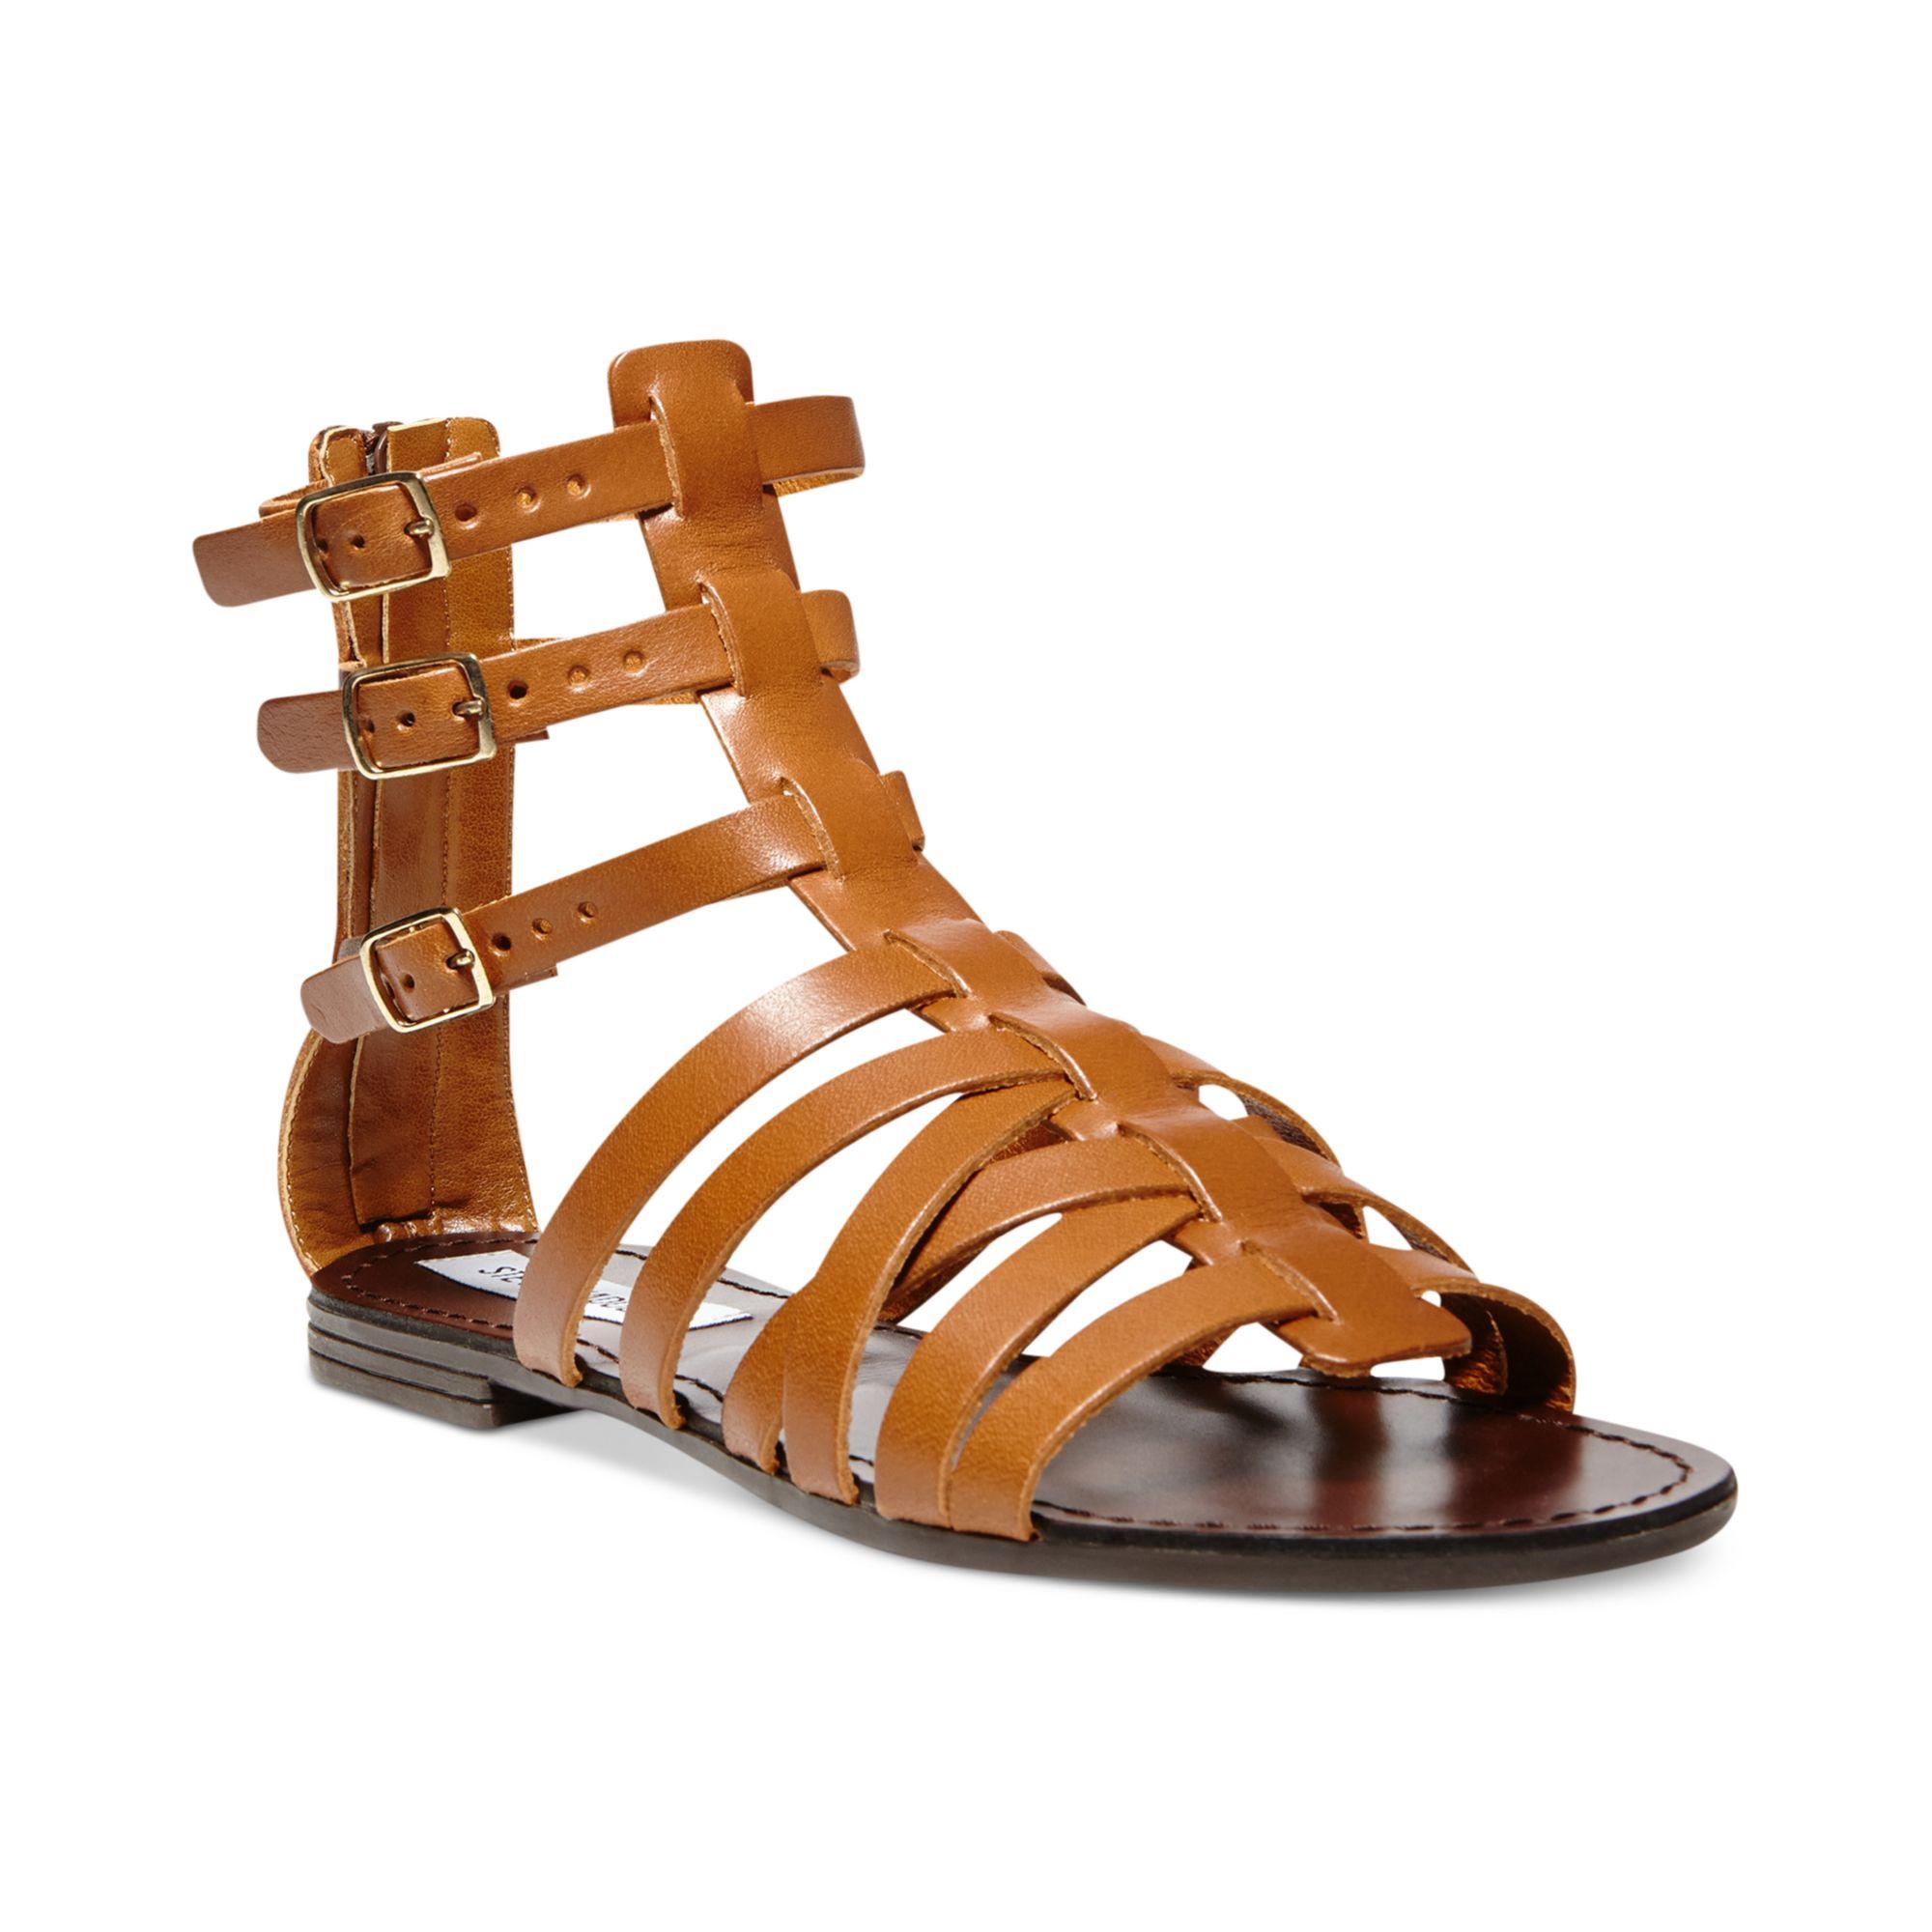 steve madden plato flat gladiator sandals in brown cognac